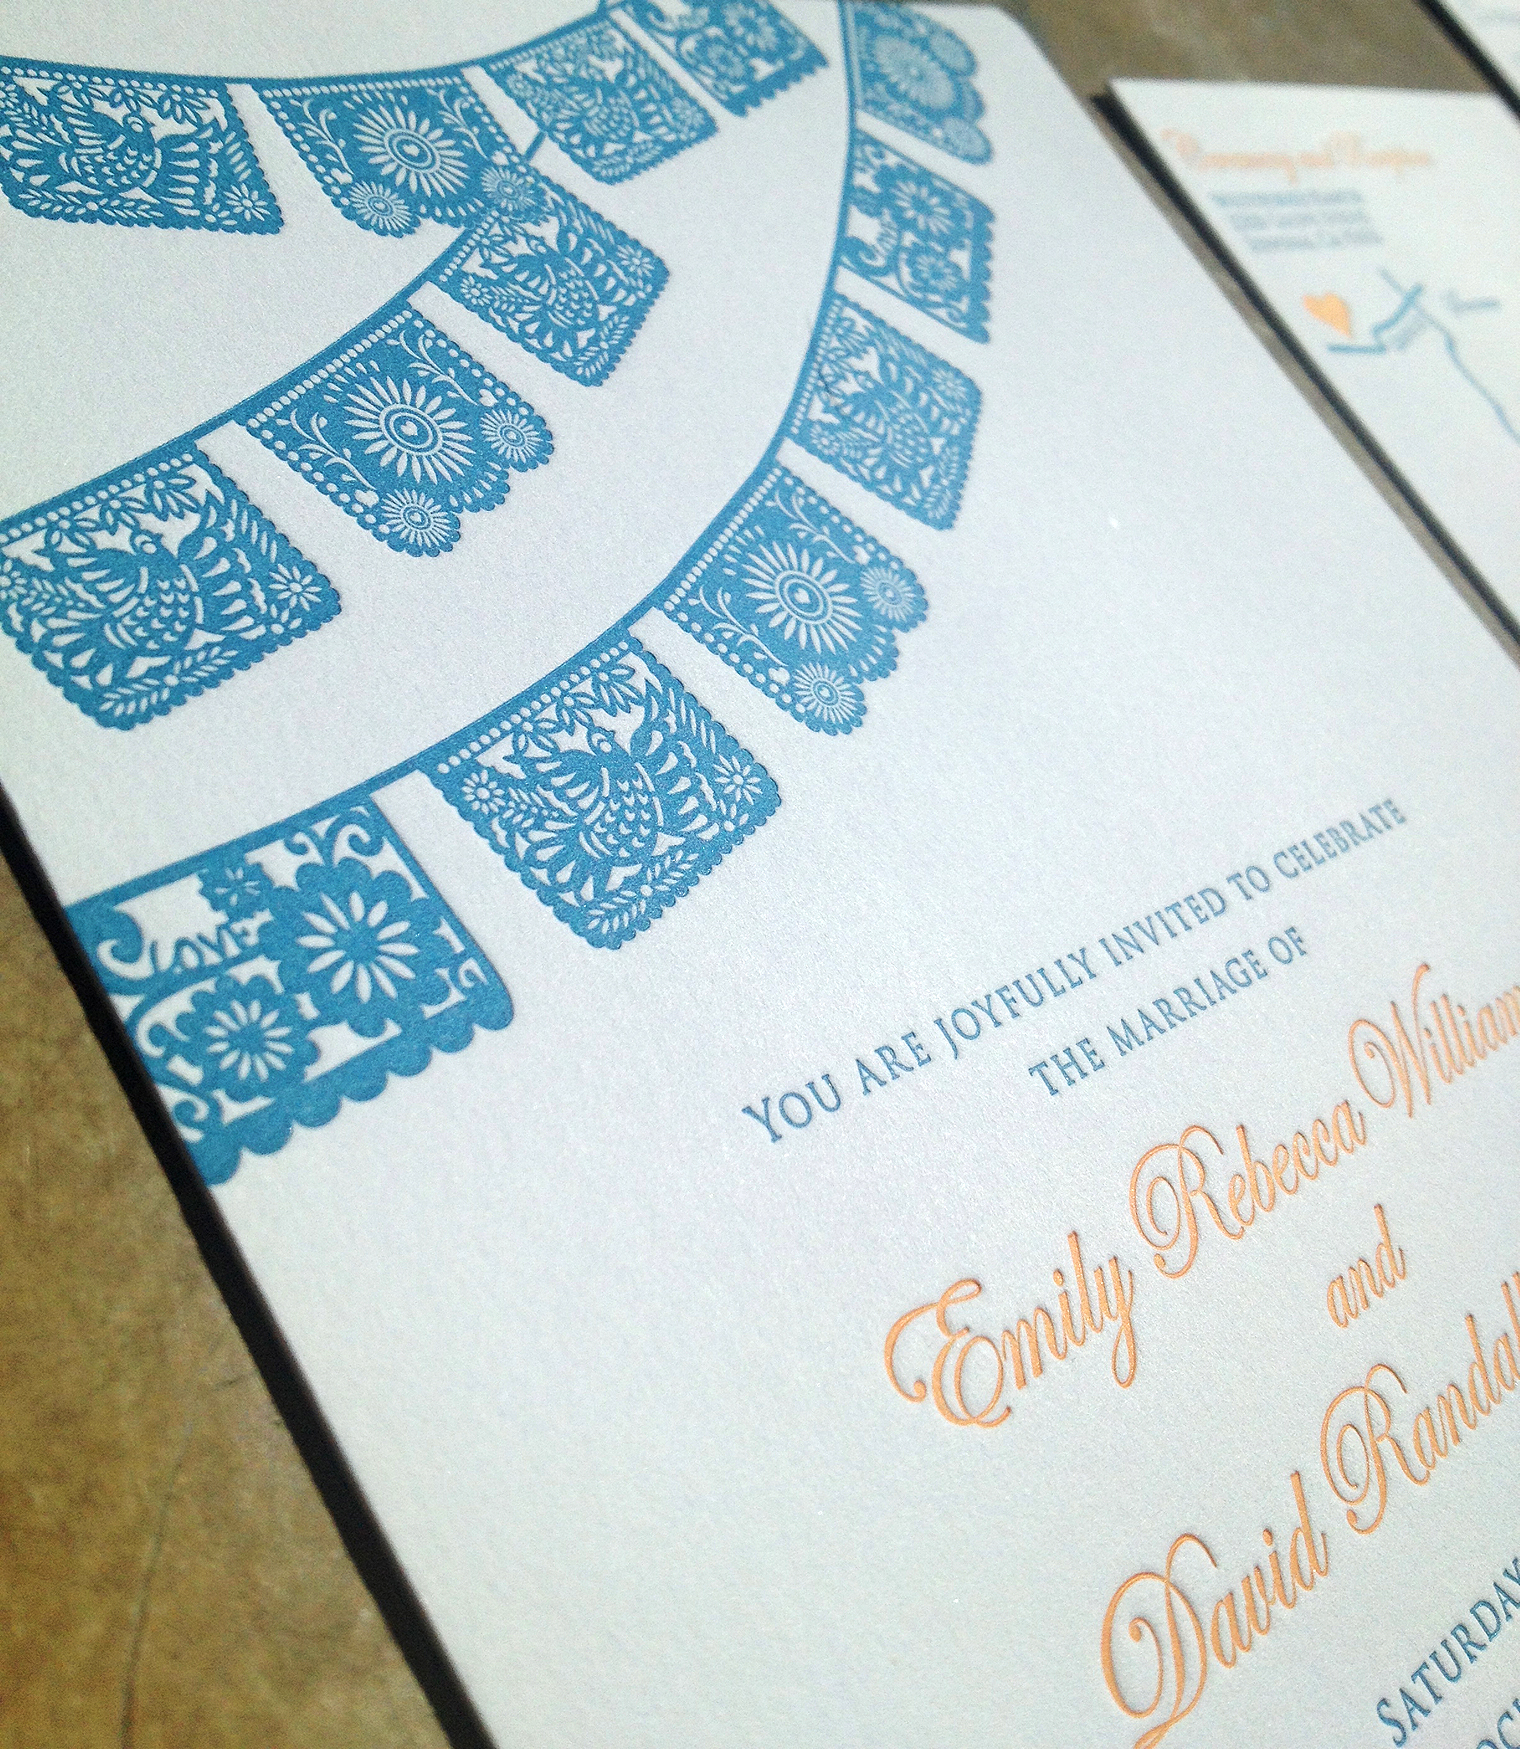 papel picado designs template - photo #43